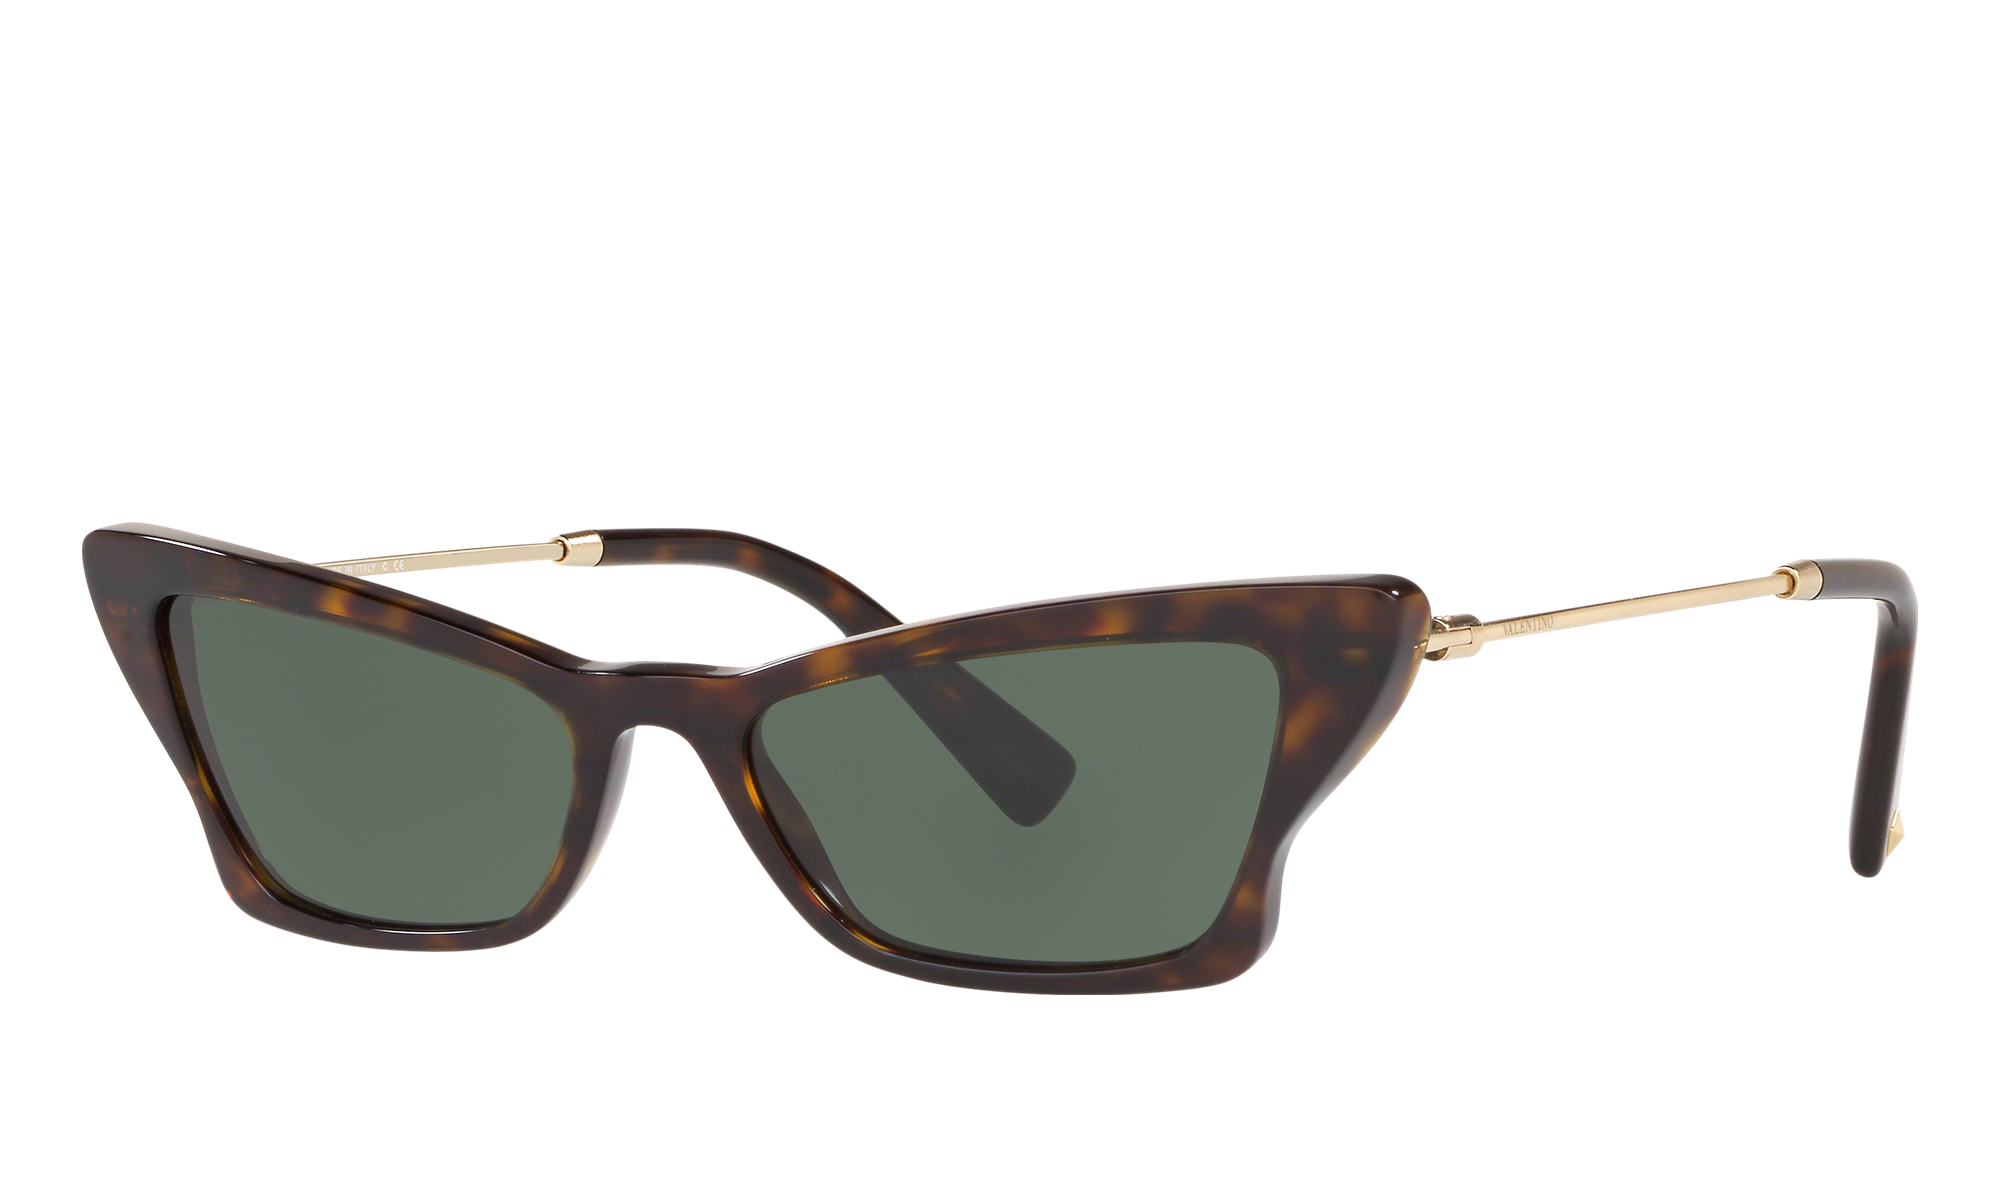 1950s Glasses, Sunglasses History for Women Valentino Unisex Va4062 Tortoise Size Standard $180.50 AT vintagedancer.com